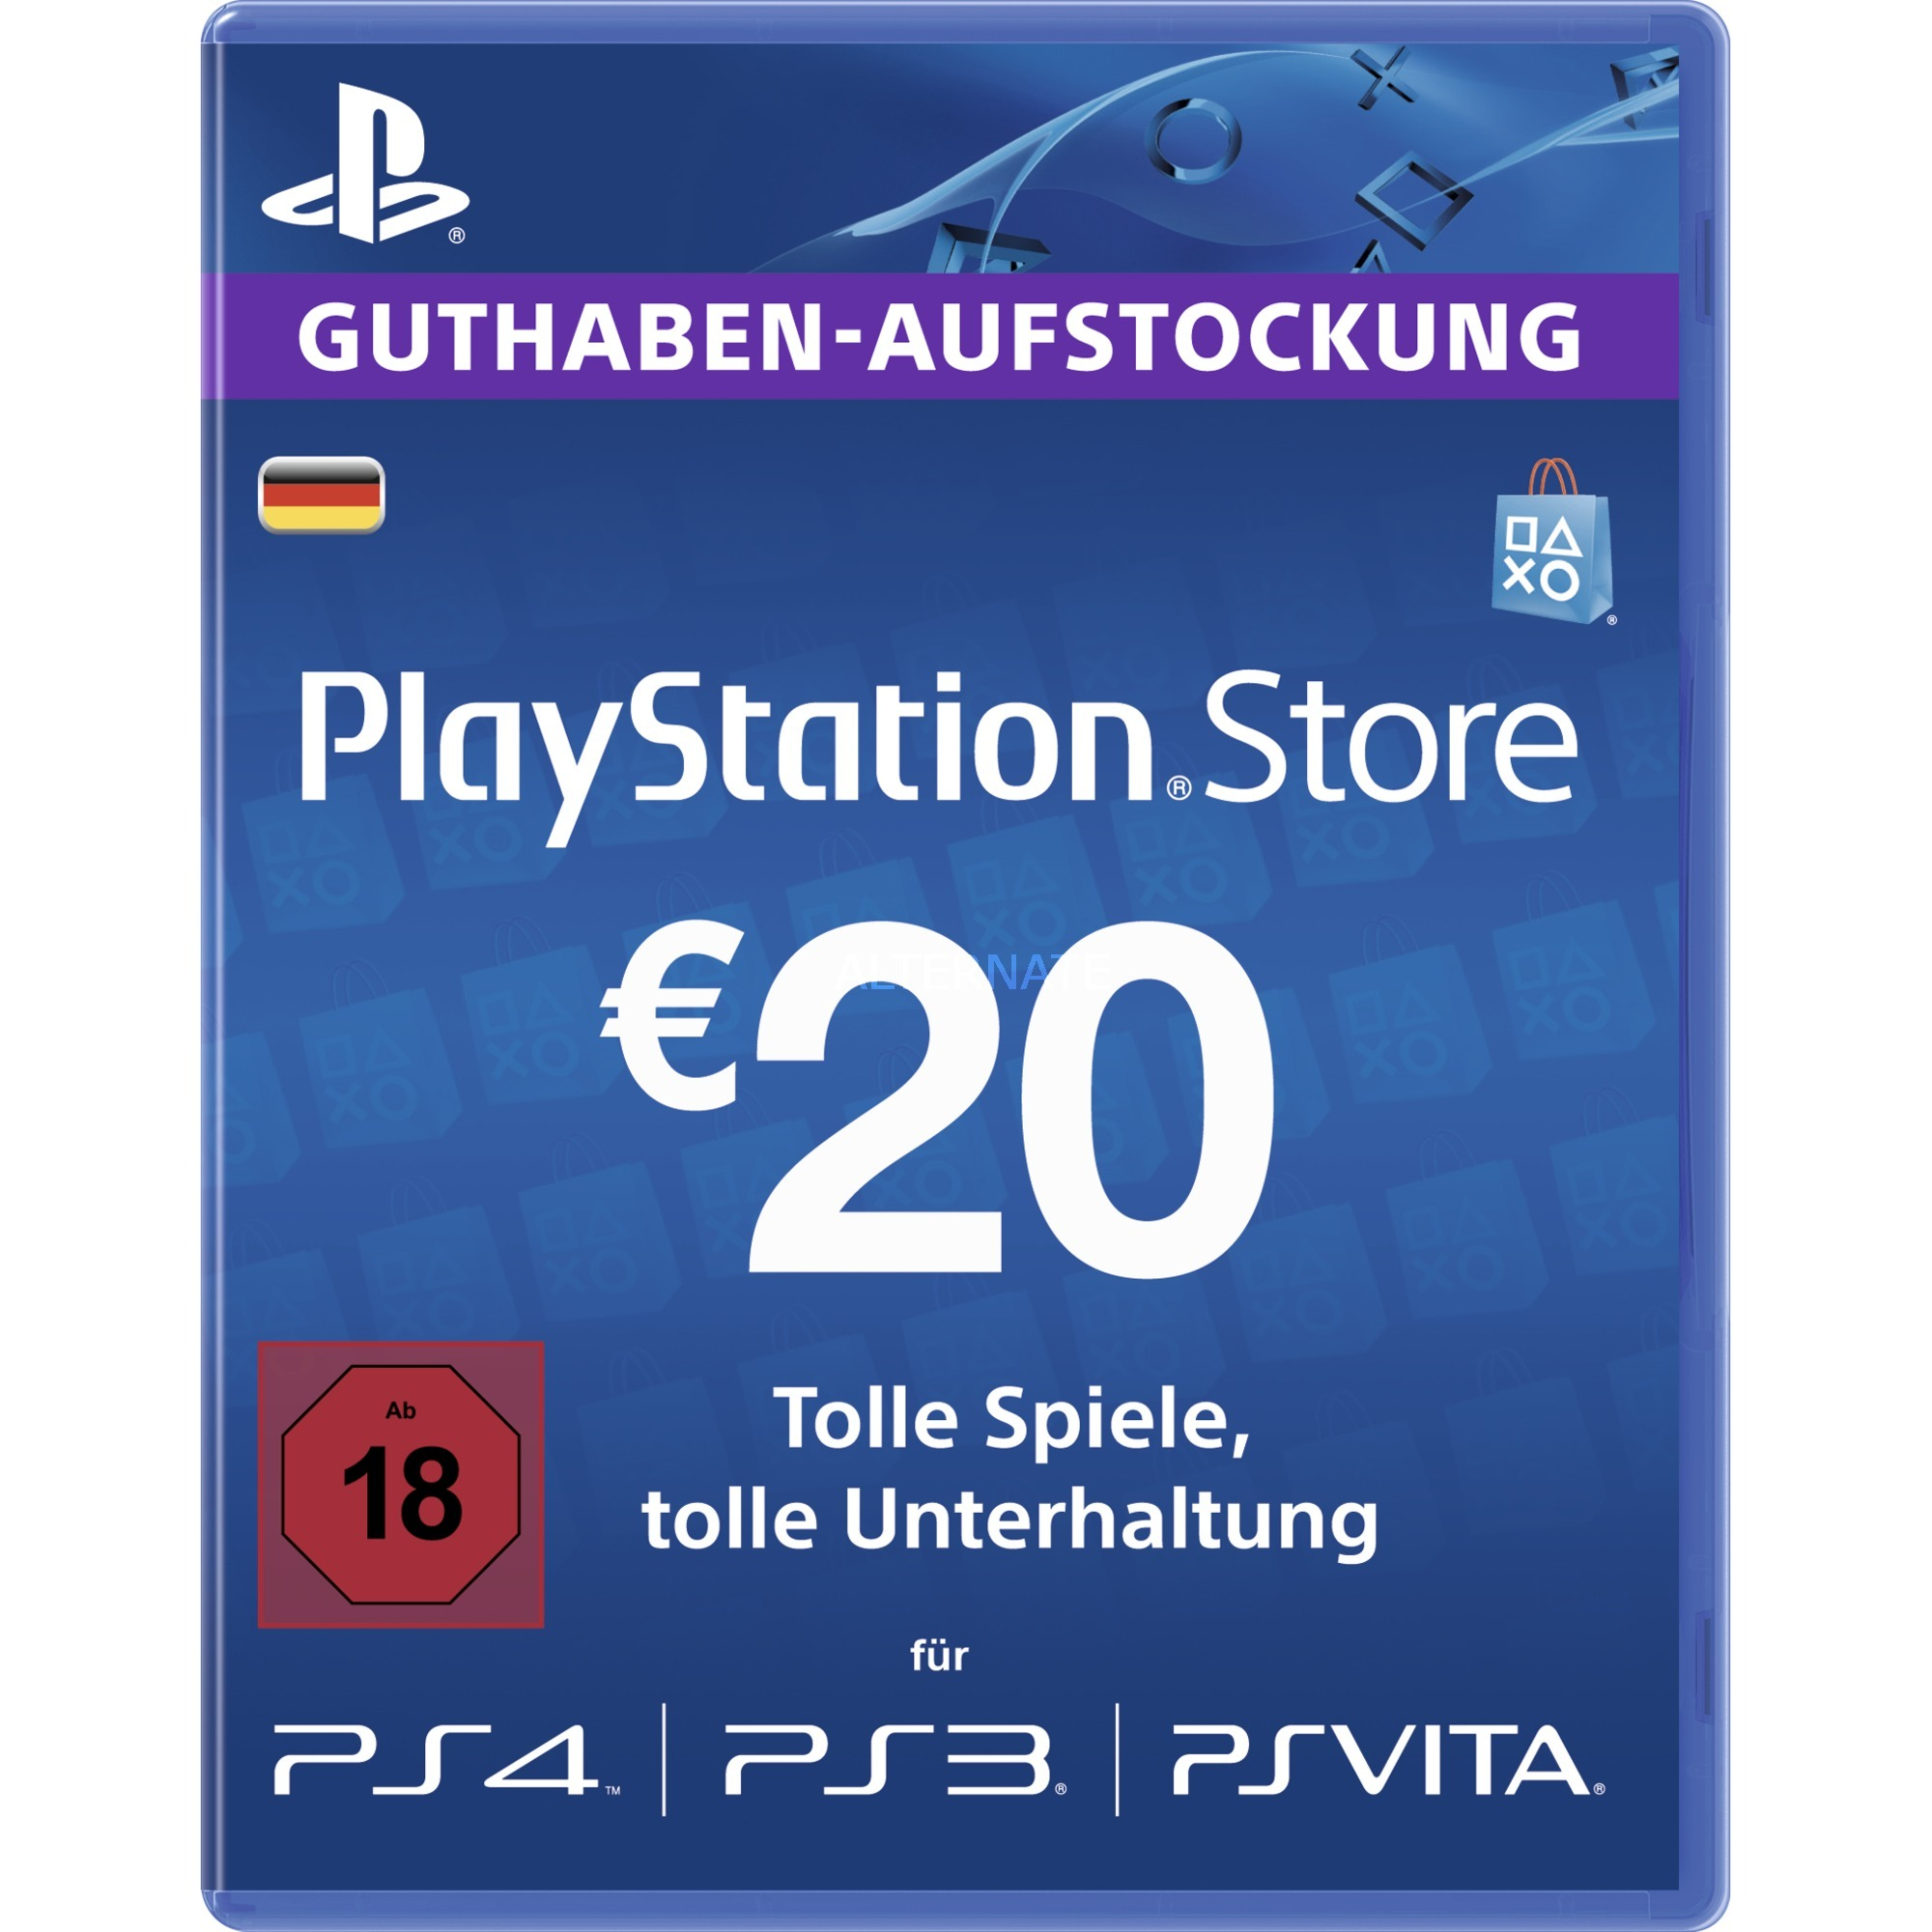 Psn Karte Kaufen.Psn Live Card 20 Euro Gamecard